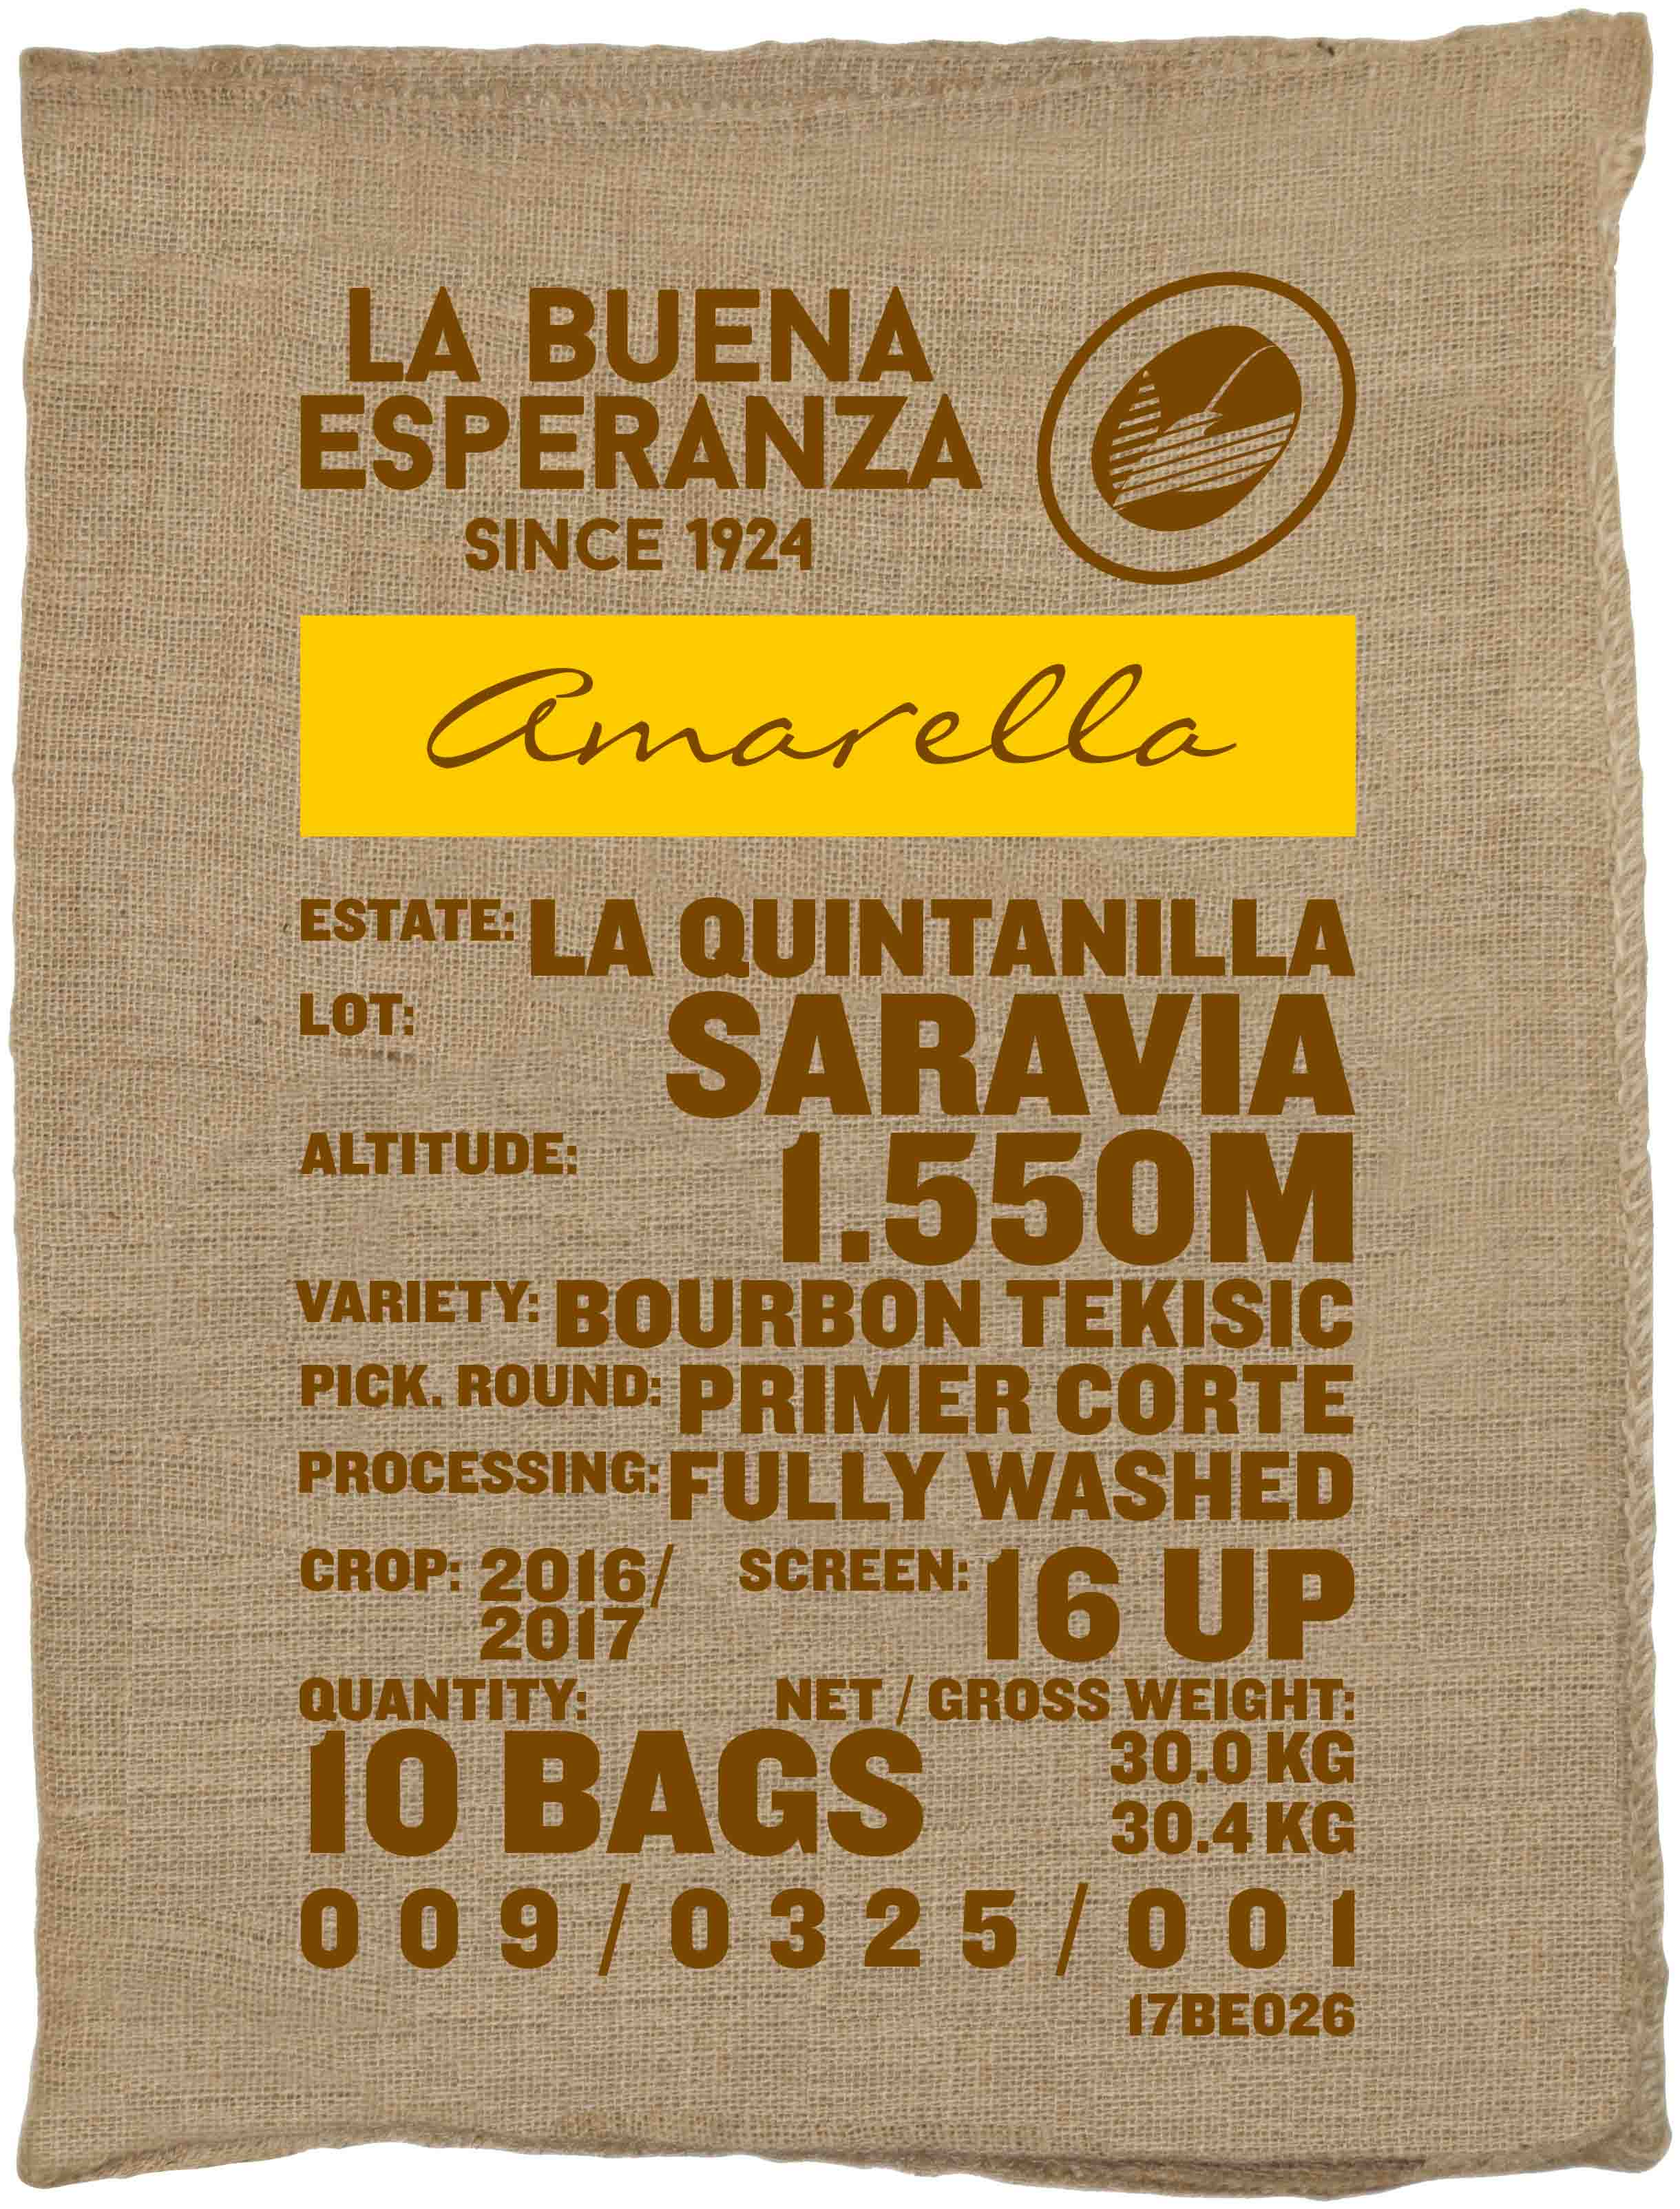 Ein Rohkaffeesack amarella Parzellenkaffee Varietät Bourbon Tekisic. Finca La Buena Esperanza Lot Saravia.